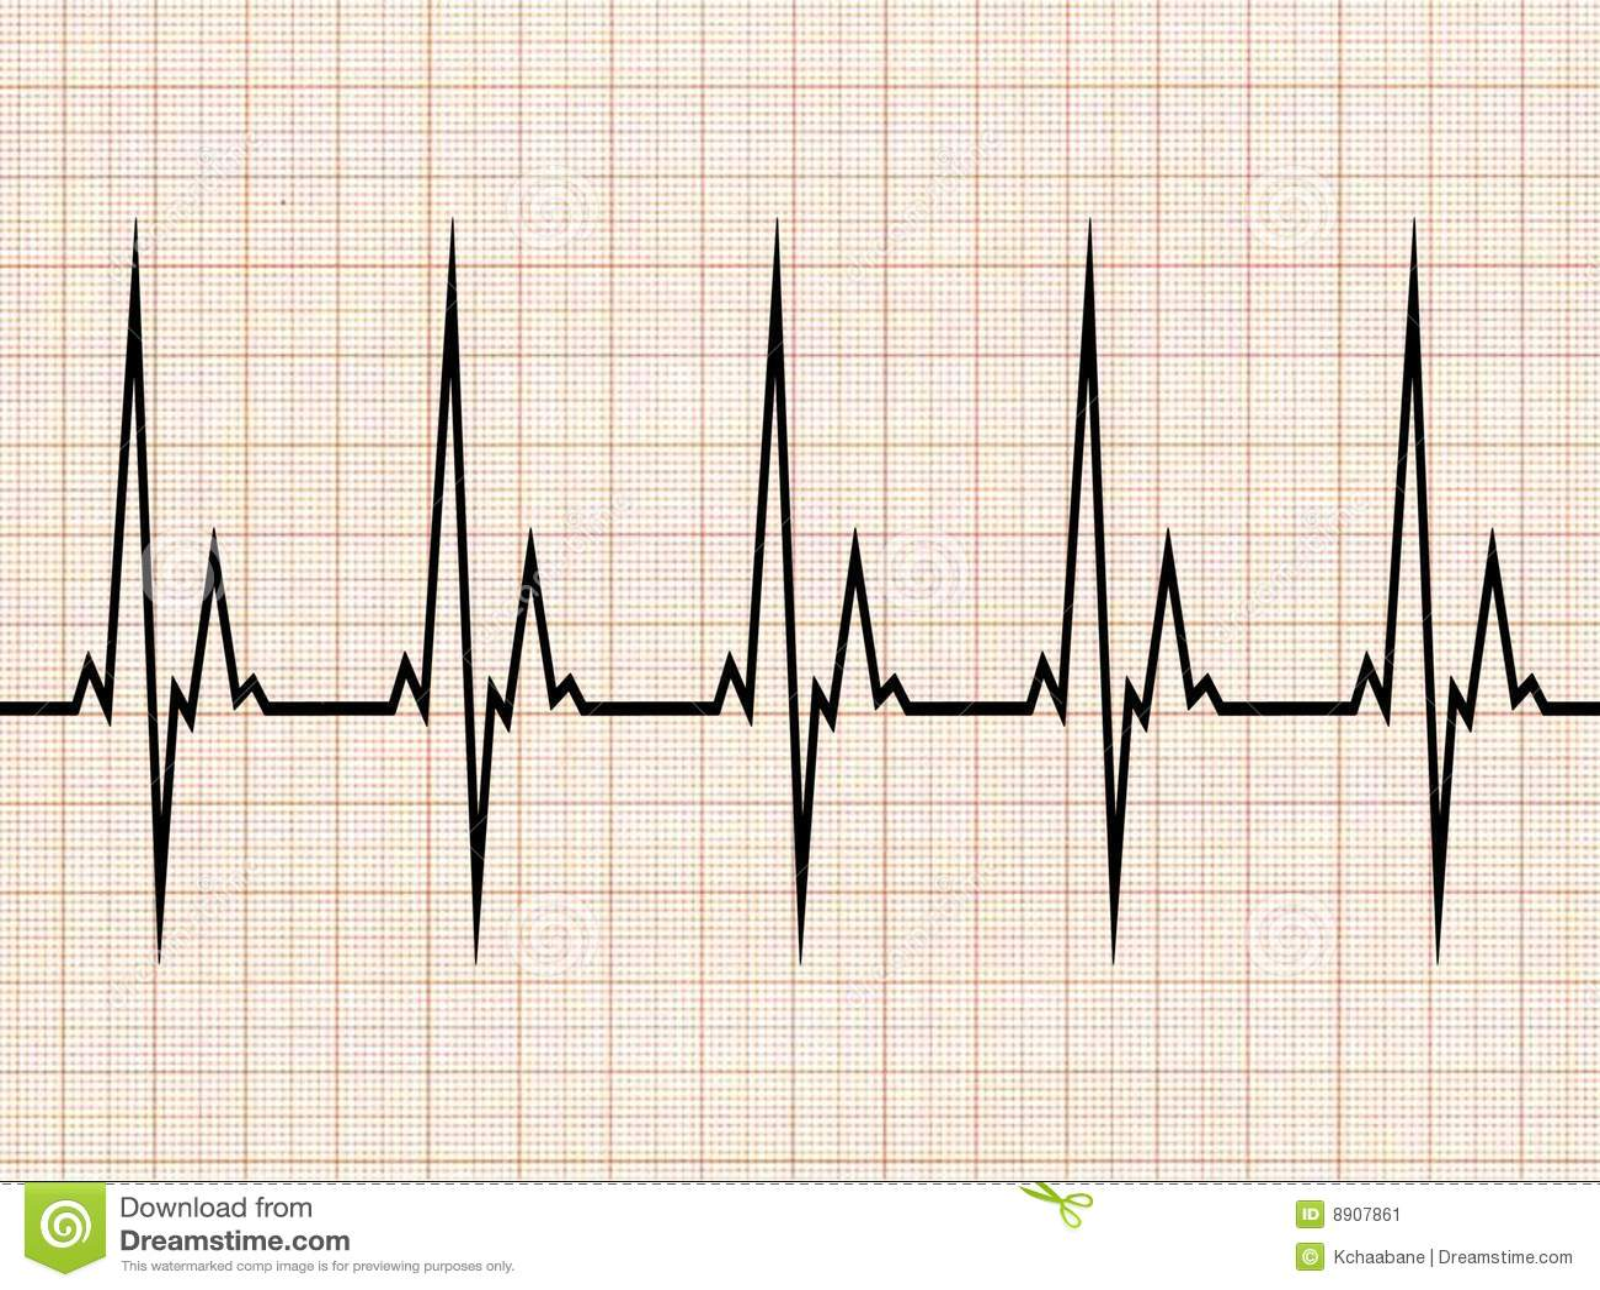 electrocardiogram stock image image 8907861 ekg vector diagram ekg vector leads